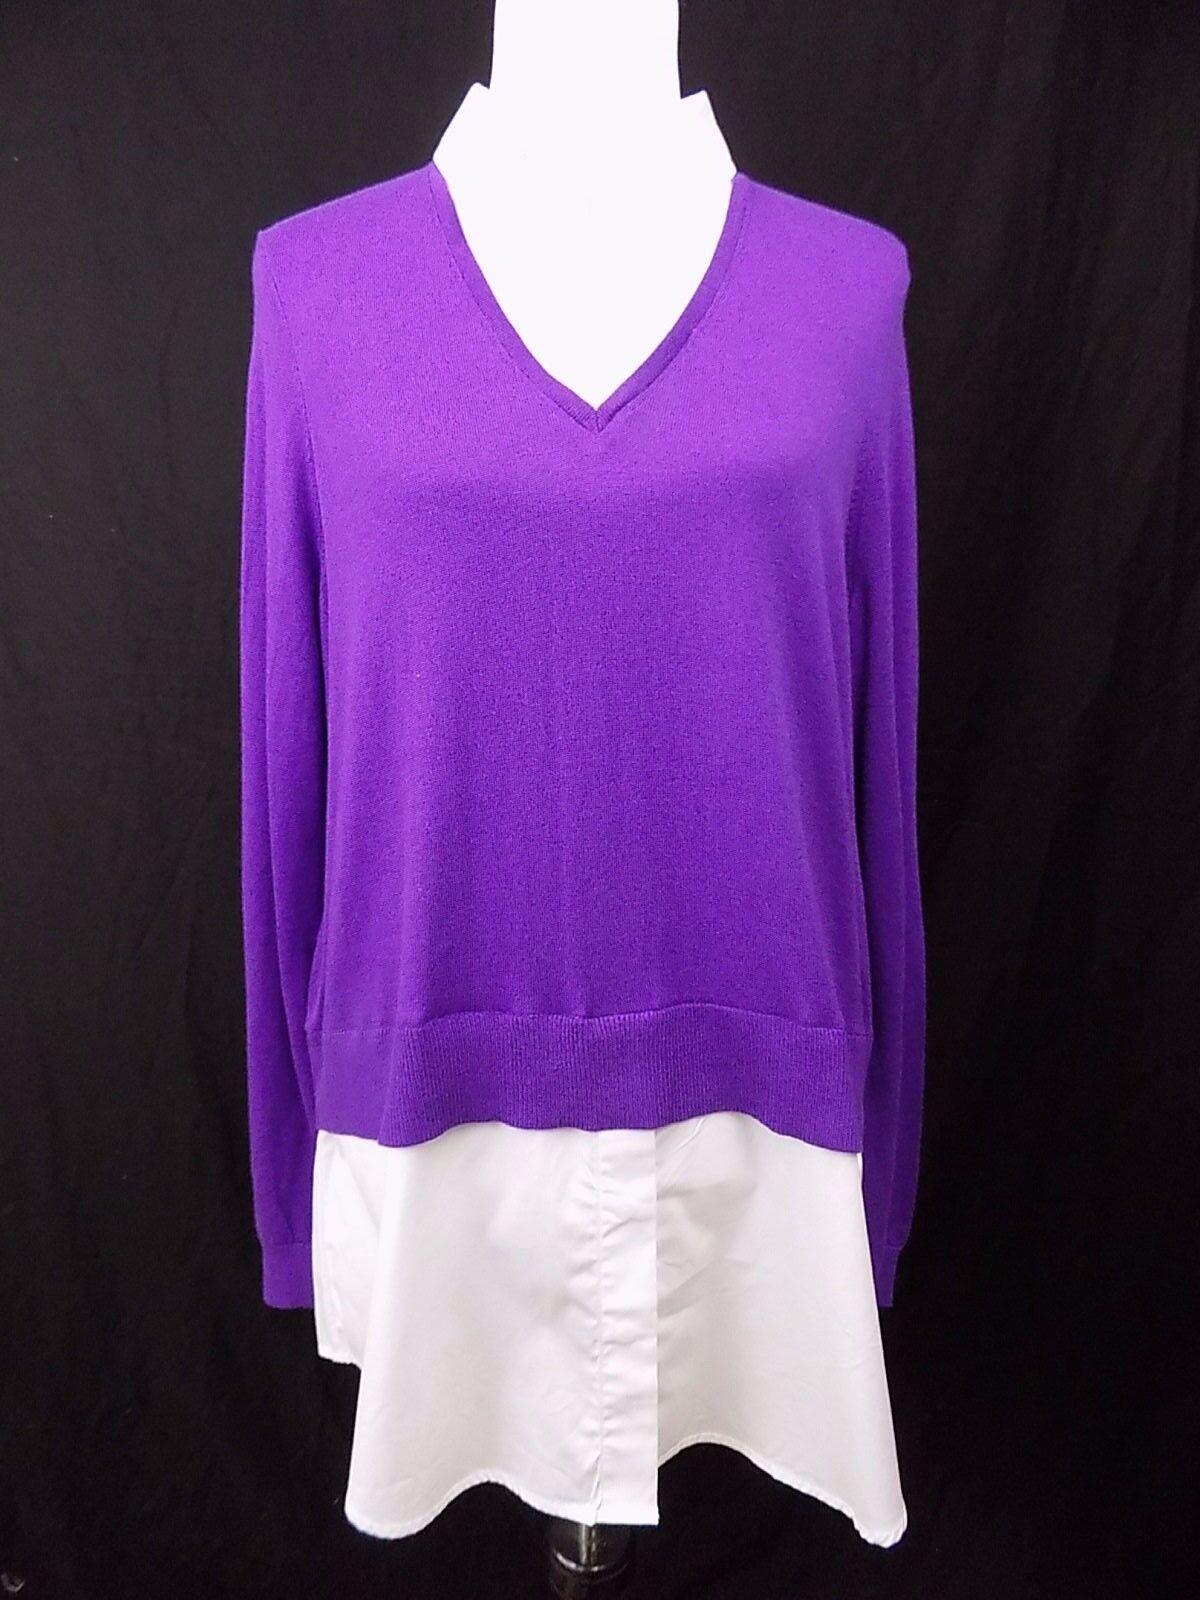 Women's Lauren Ralph Lauren LRL Purple Shirt Sweater XL  New